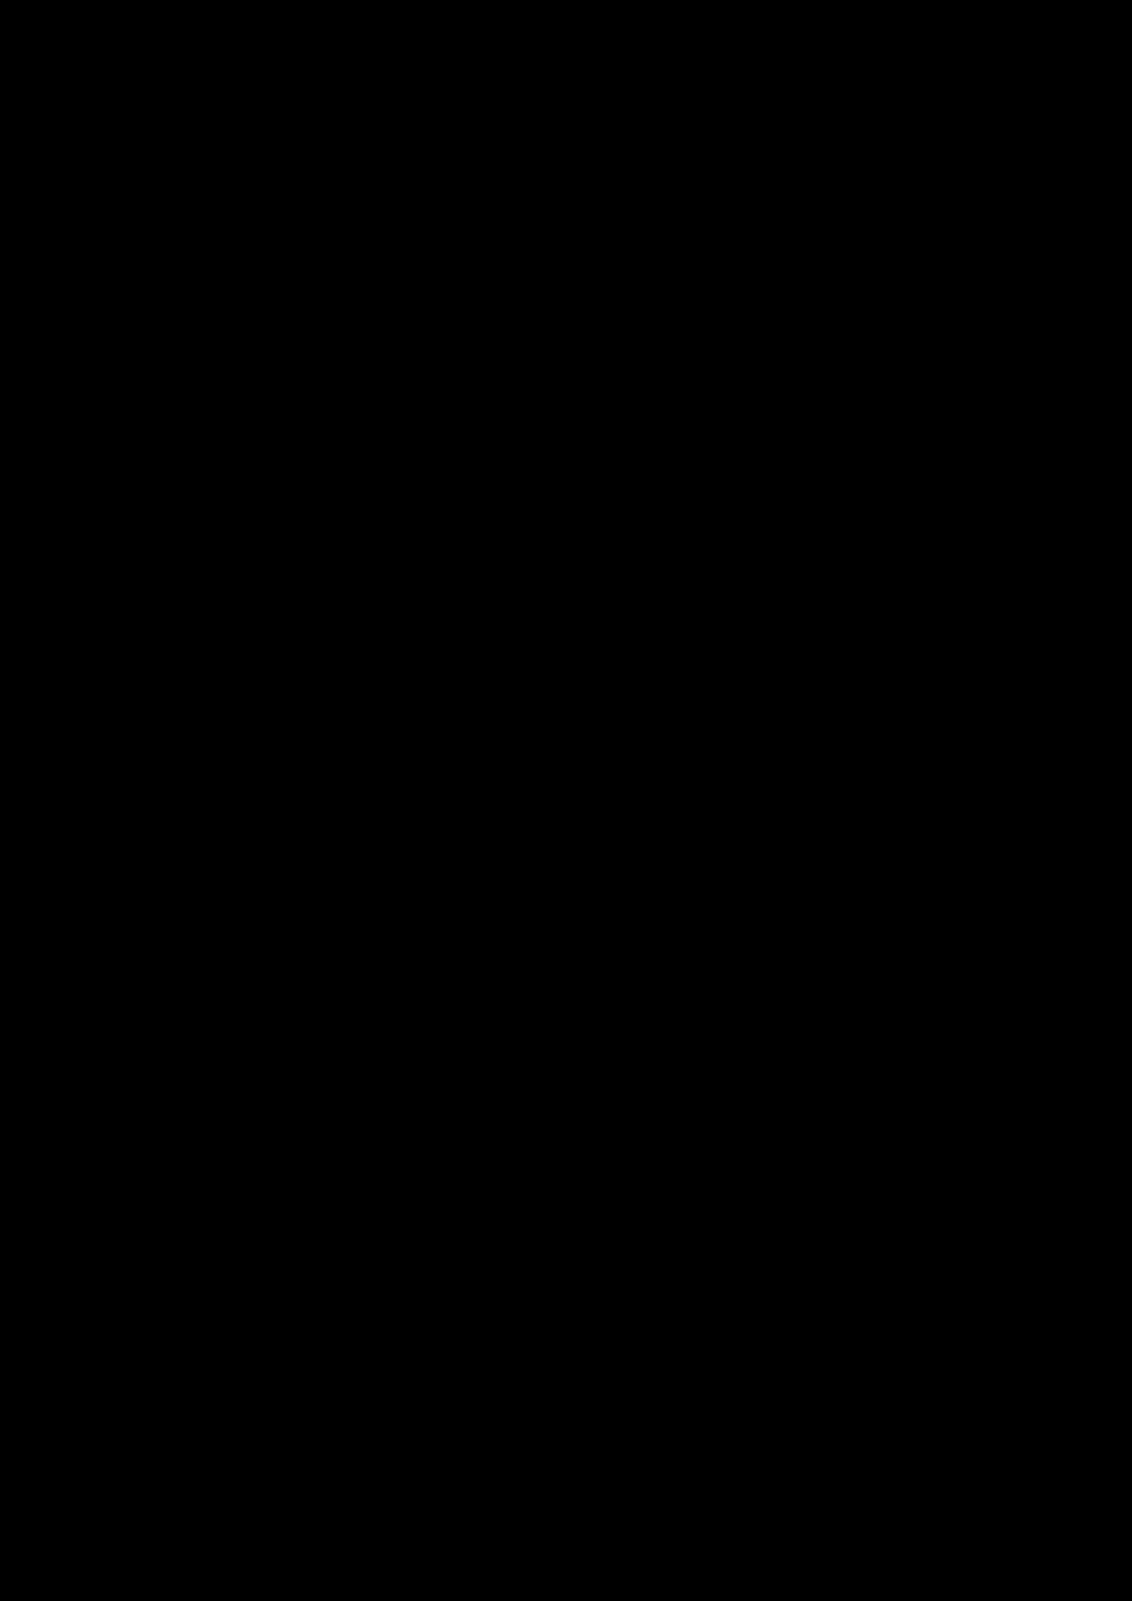 Belyiy sokol slide, Image 125